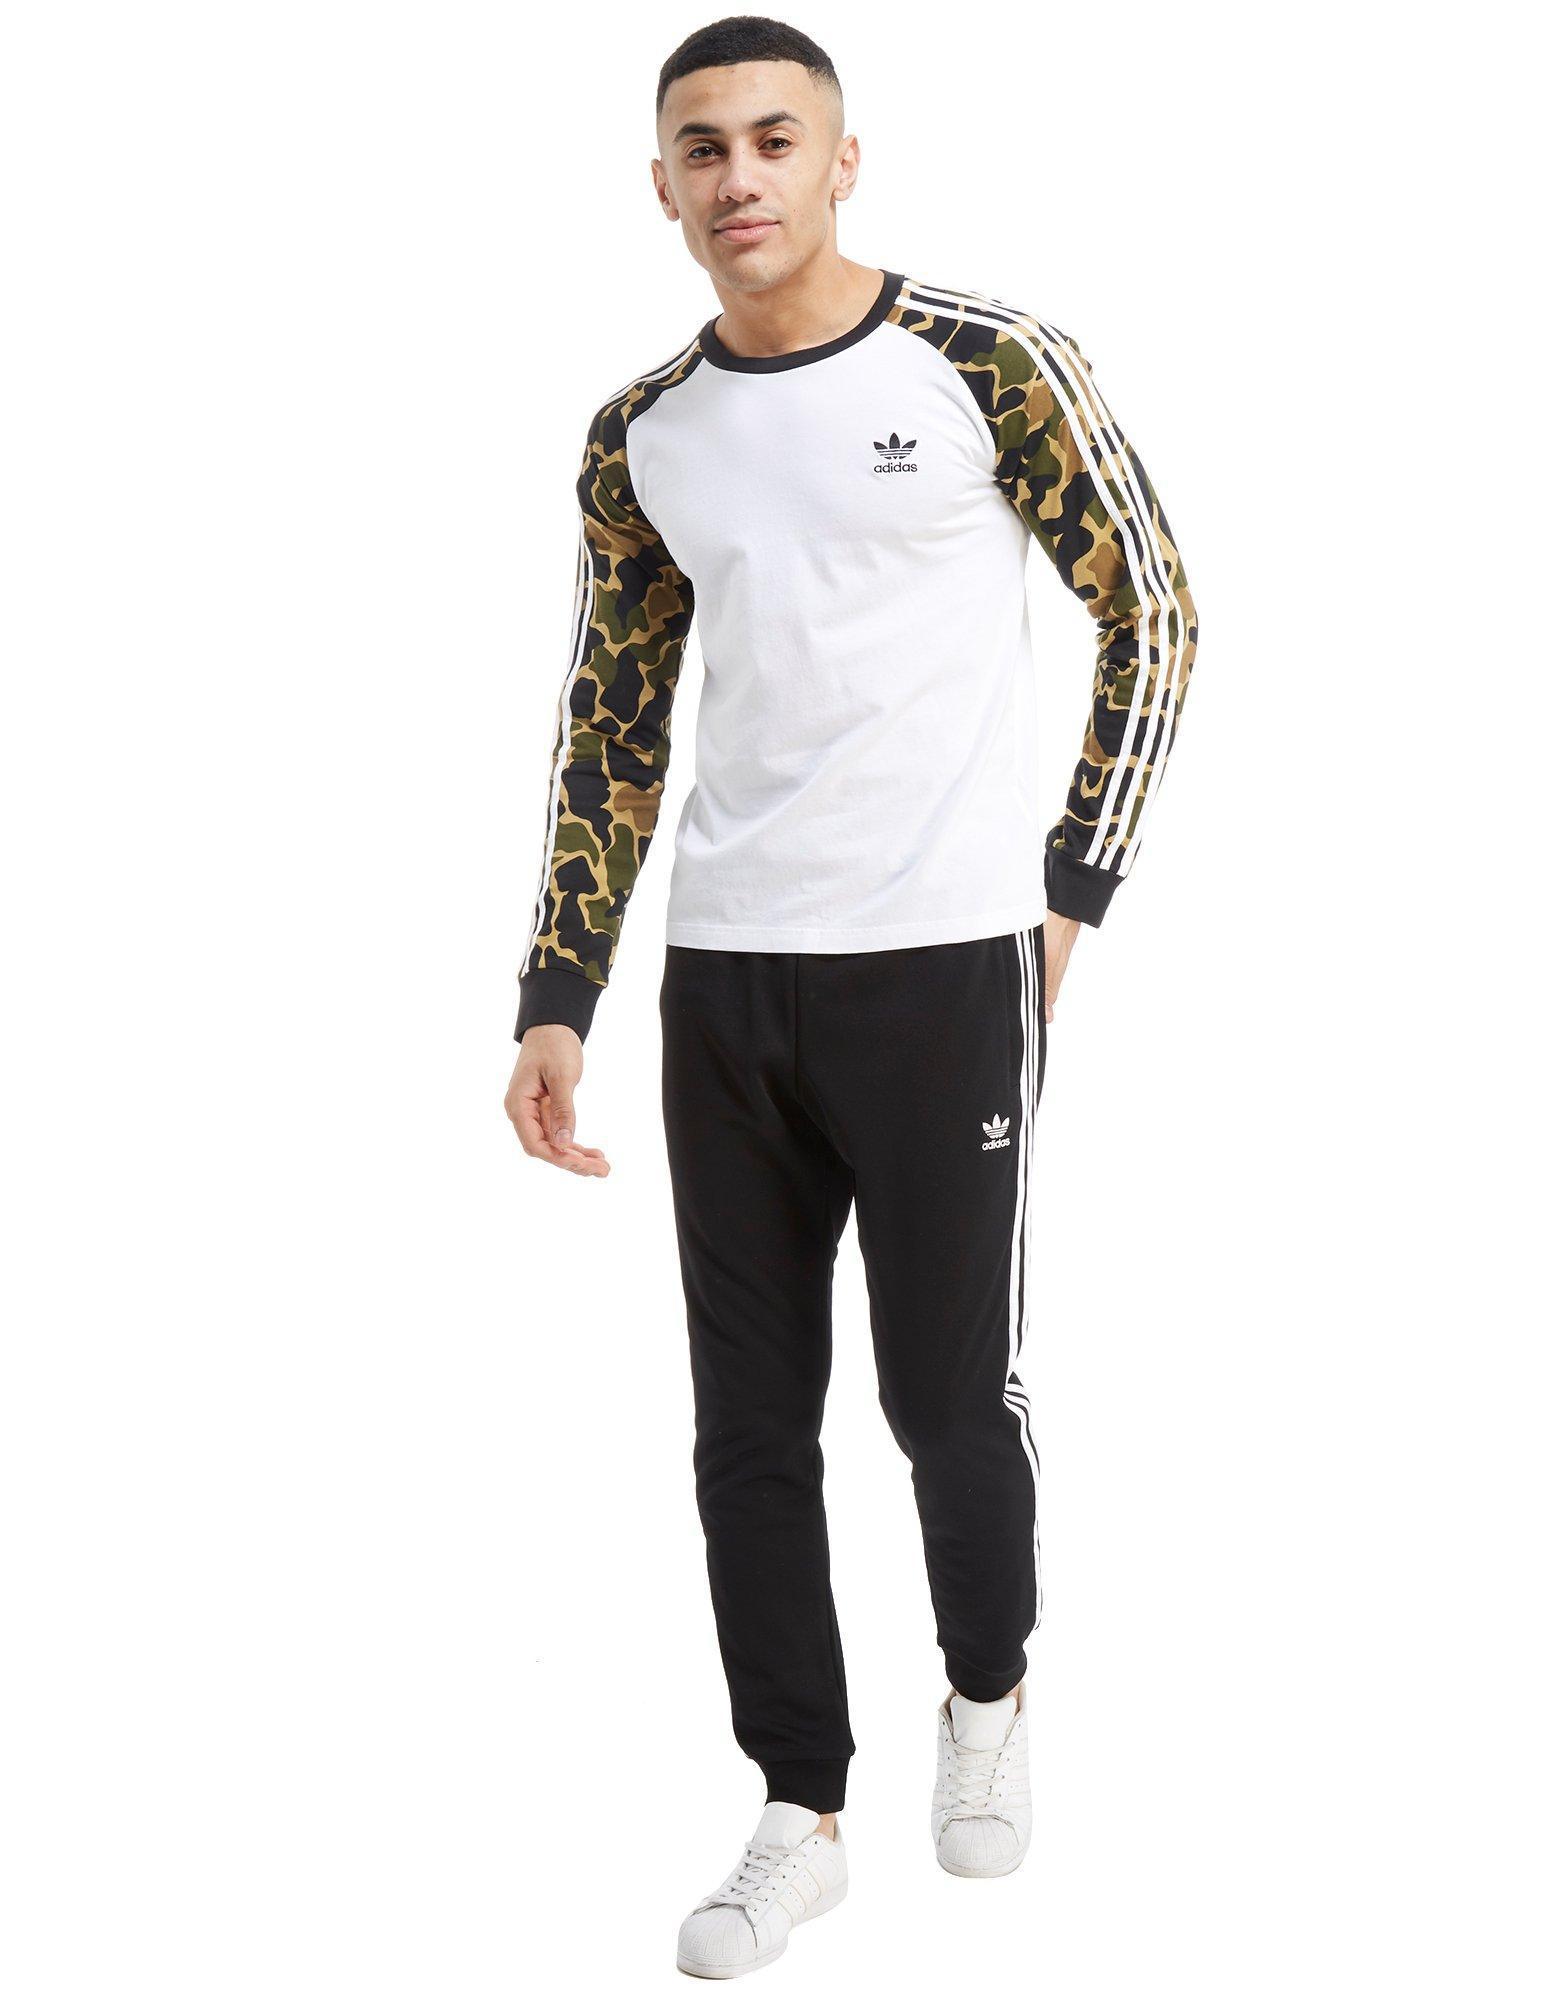 68df0df3 adidas Originals California Long Sleeve T-shirt in White for Men - Lyst